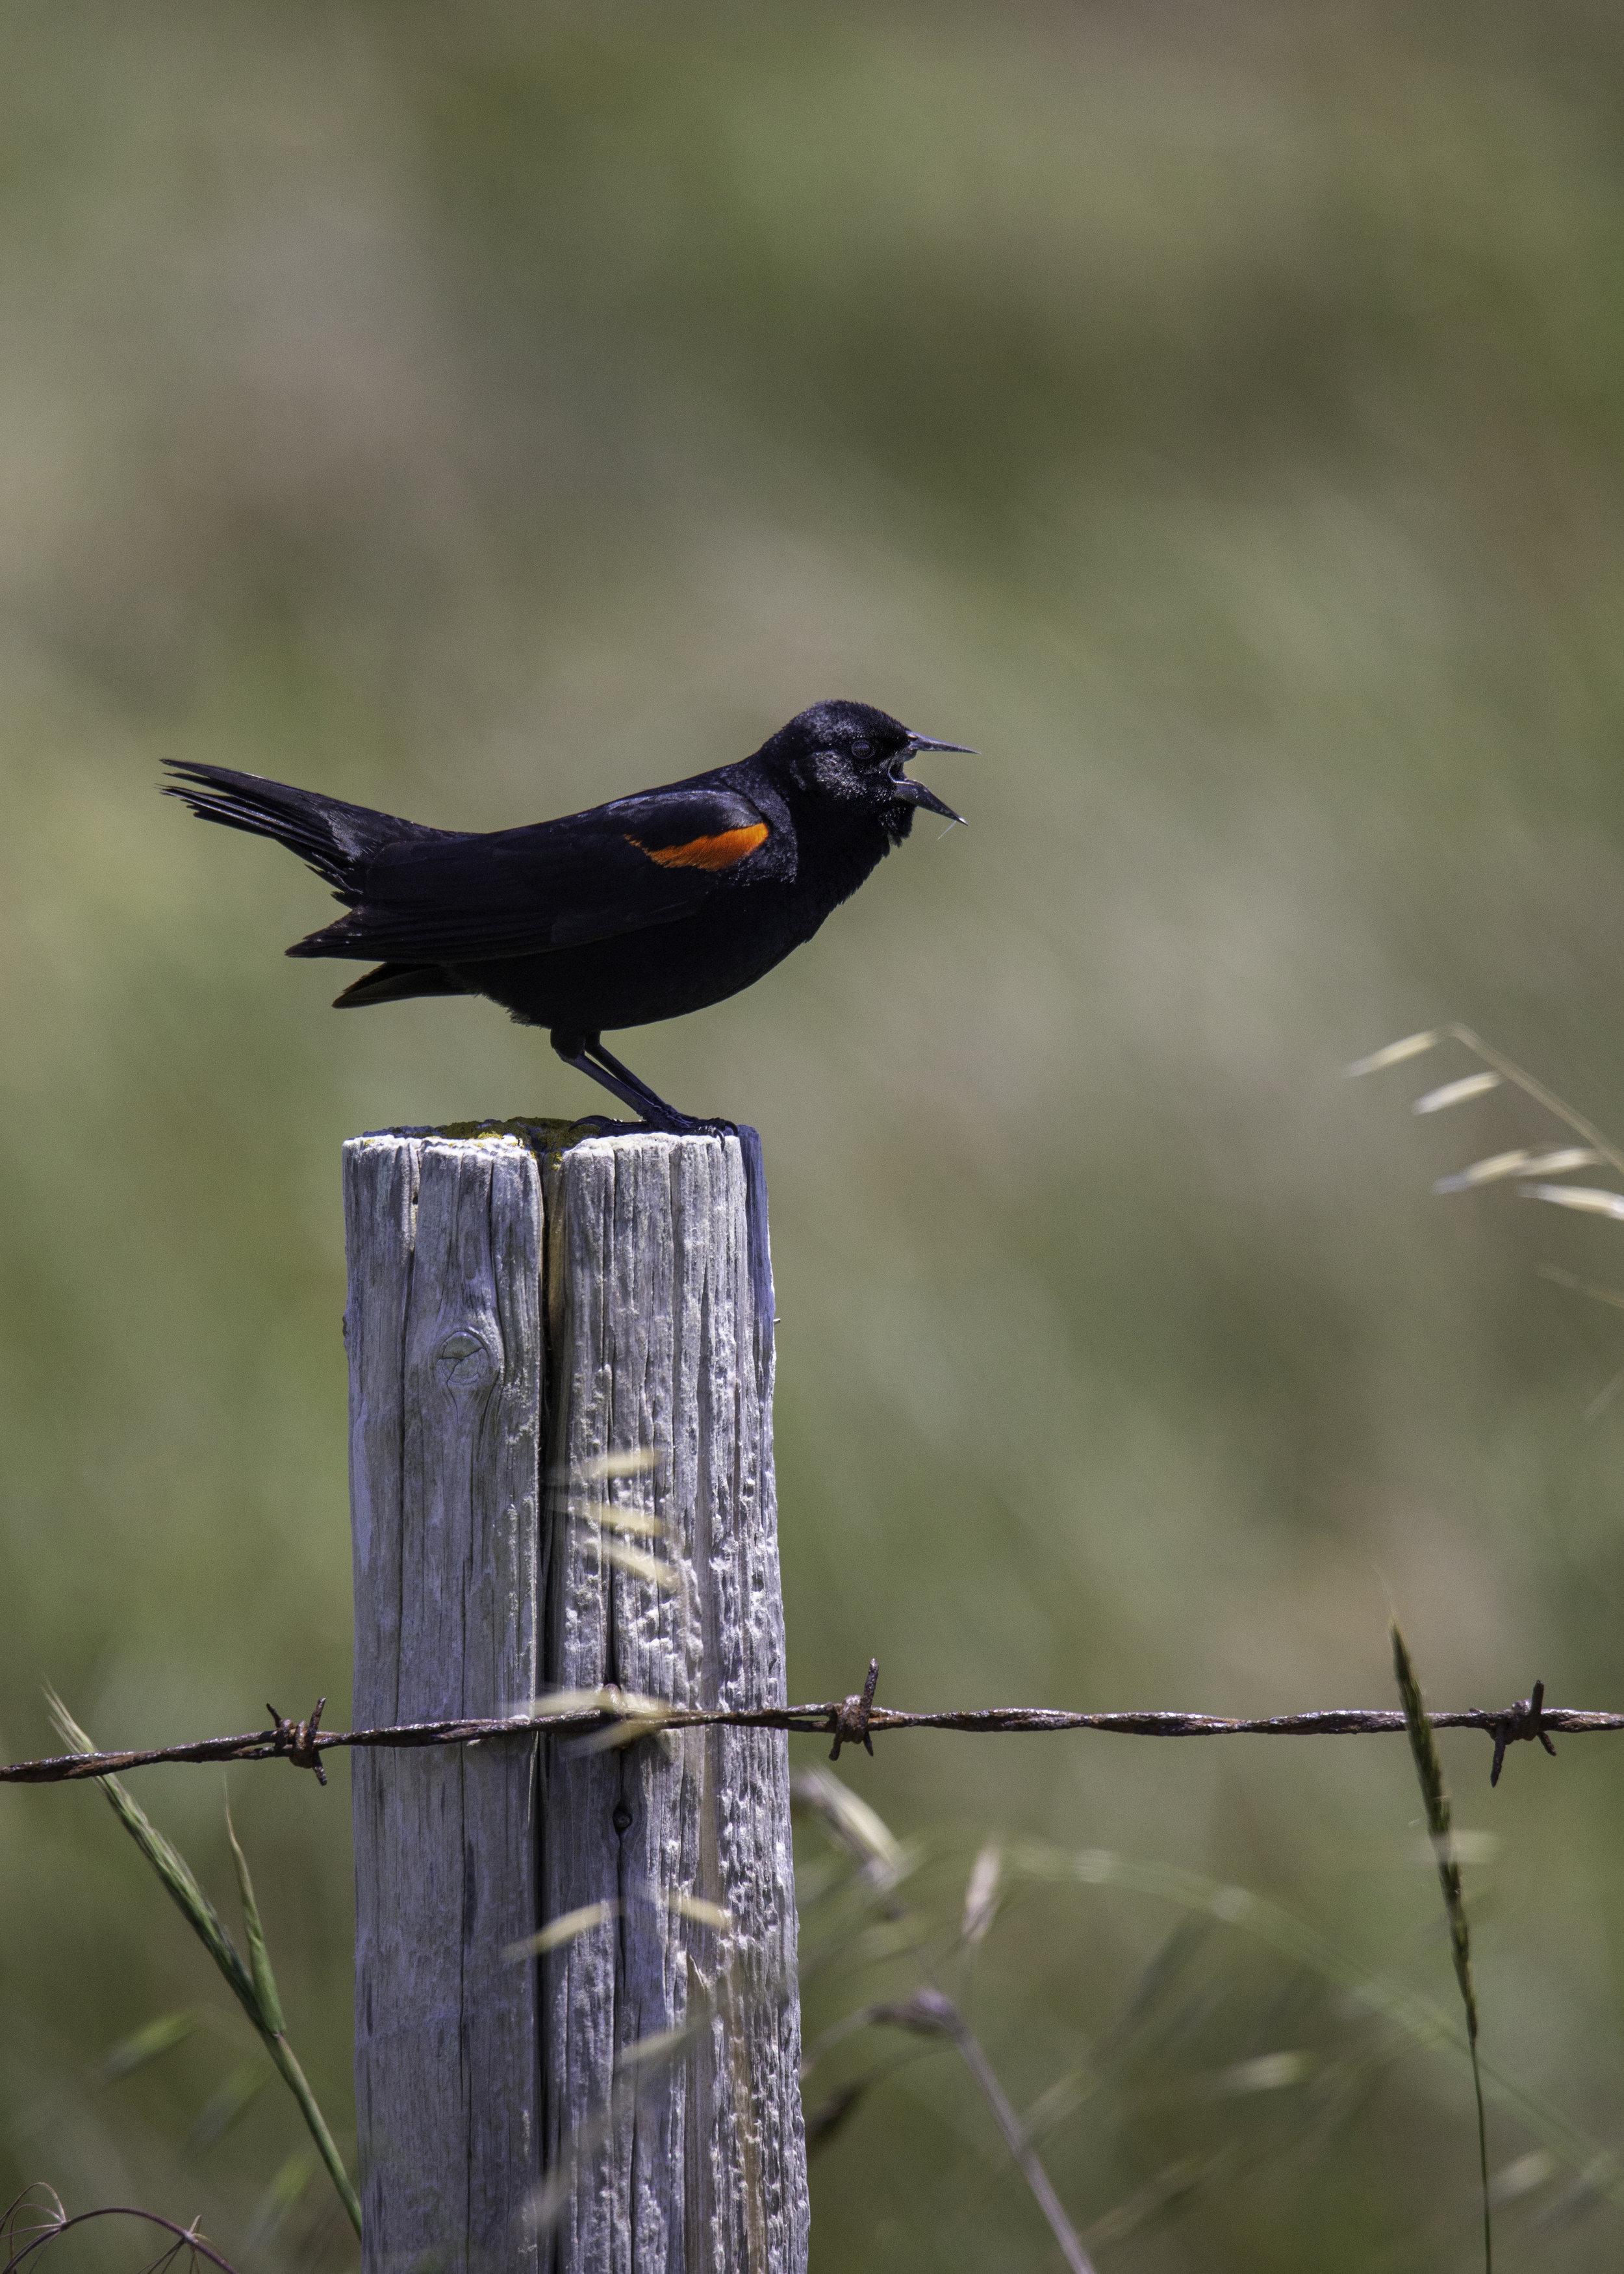 pointreyes-redwingedblackbird1.jpg